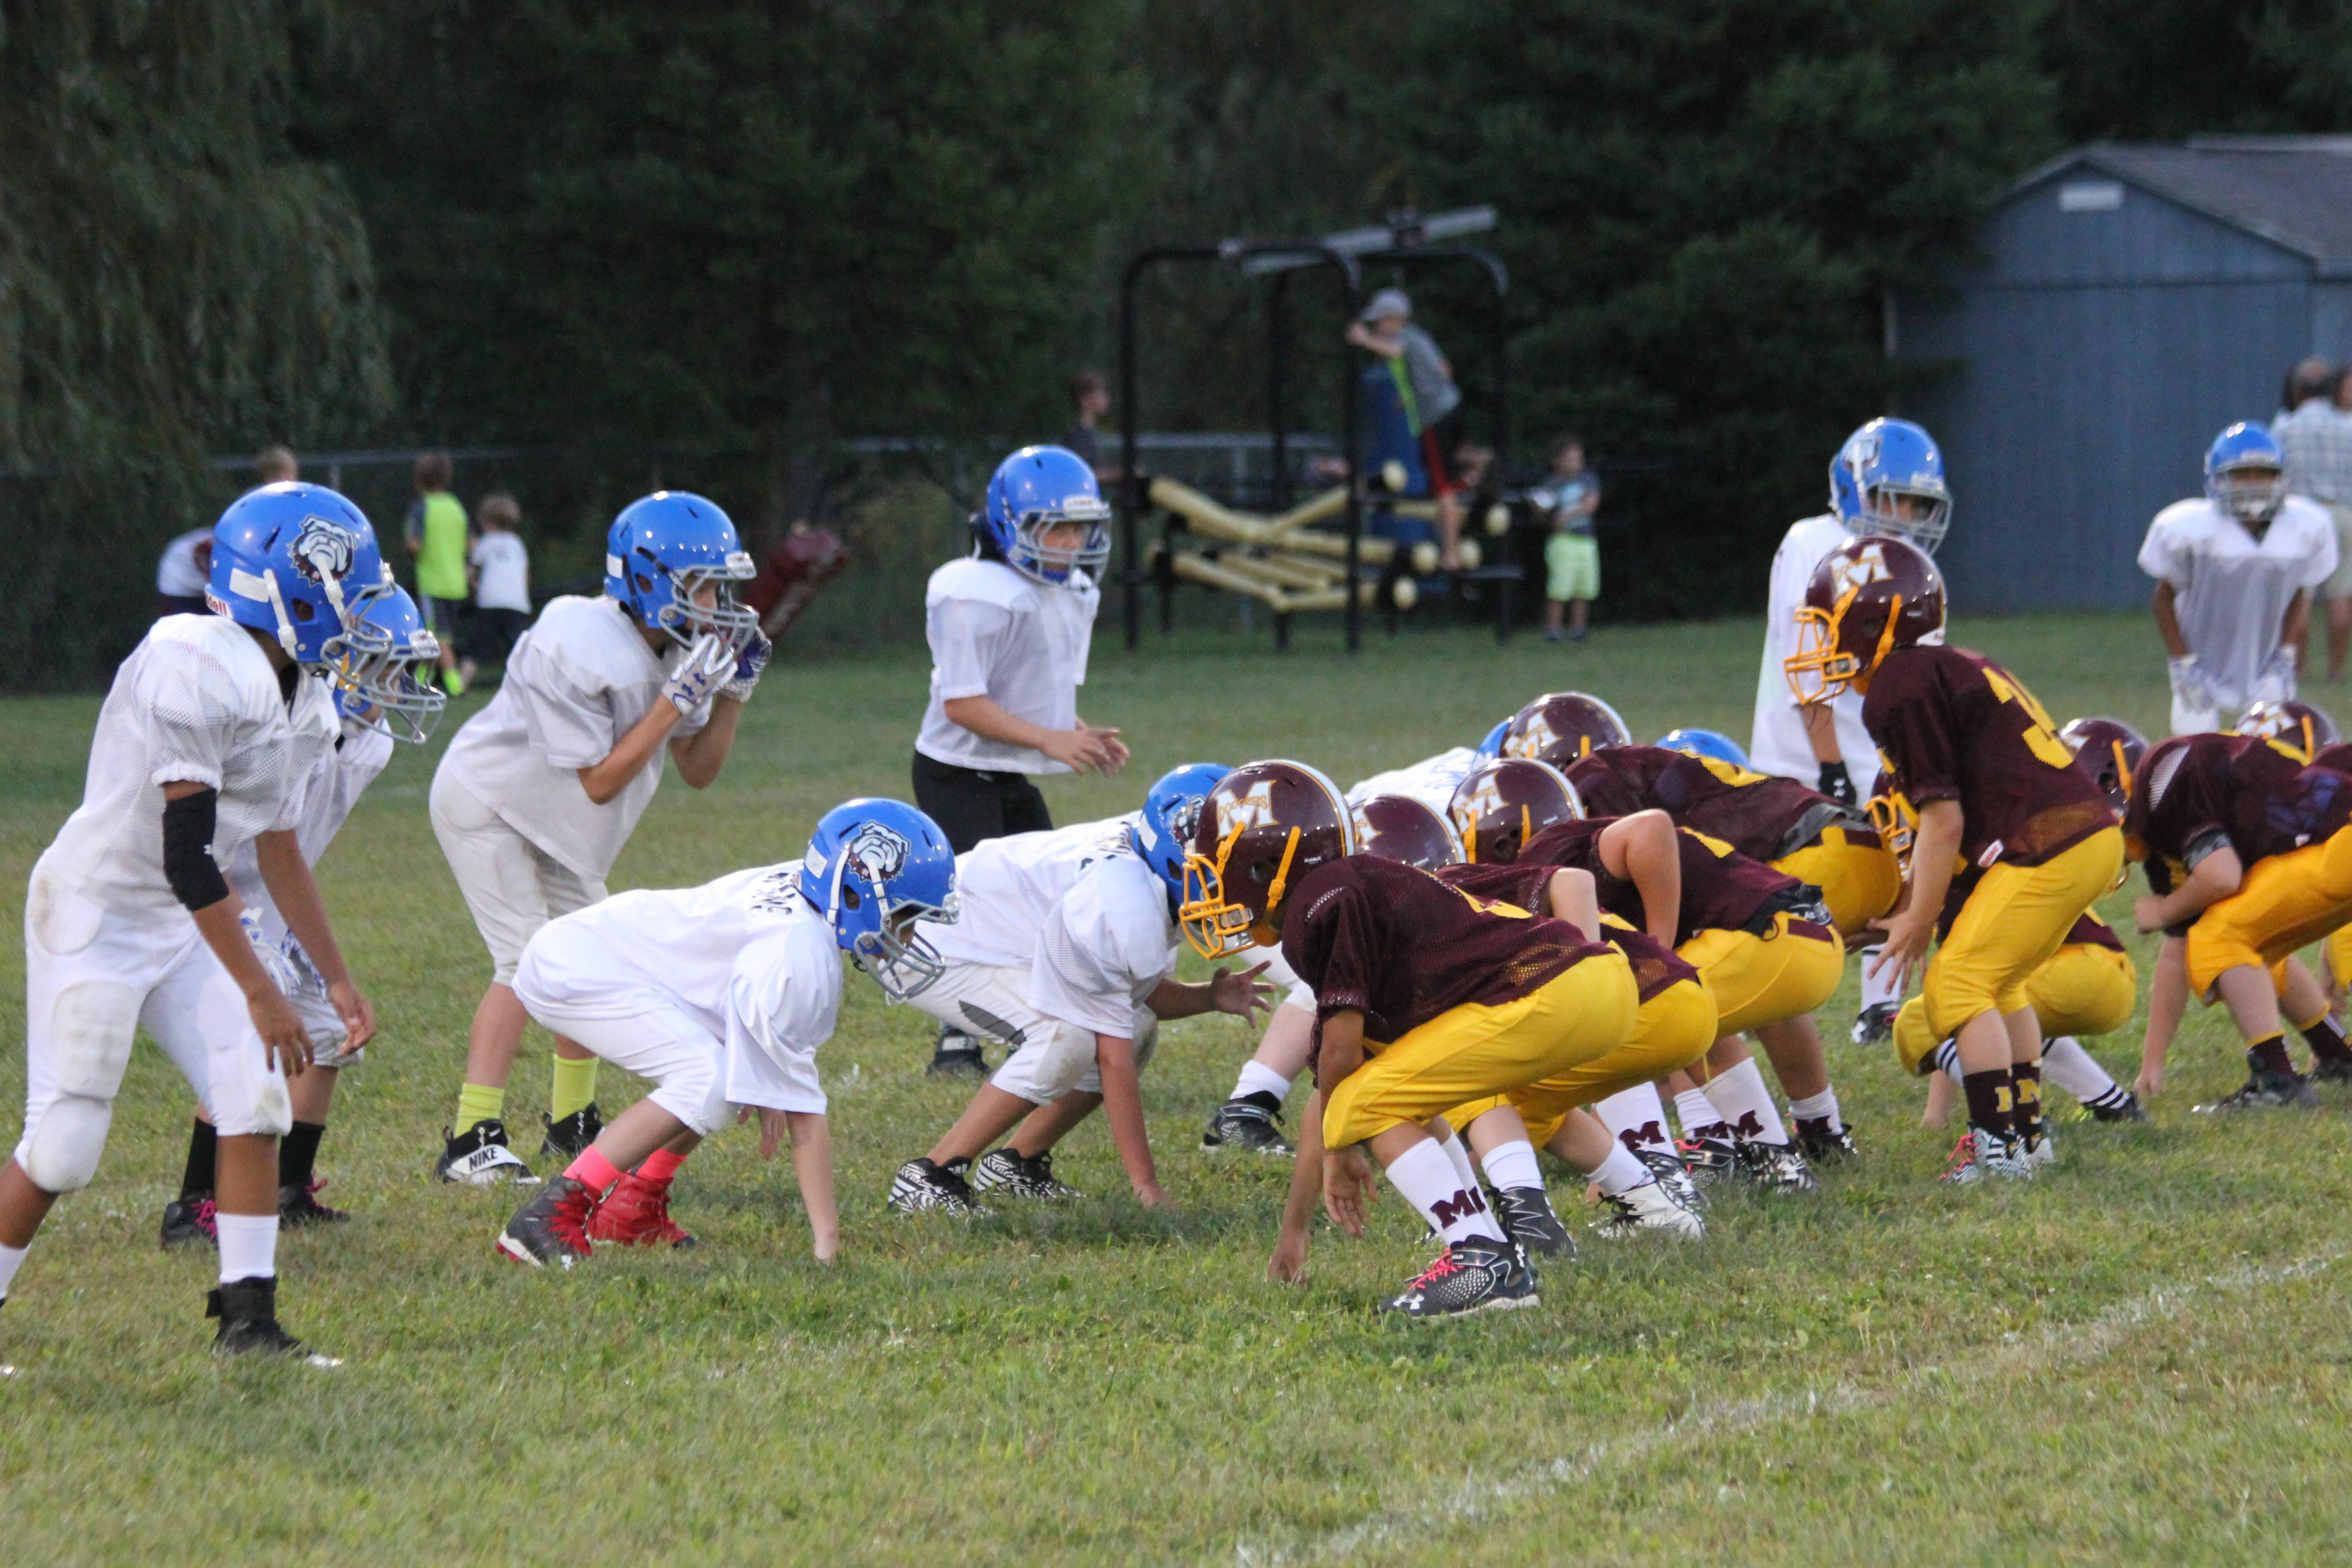 Randolph And Madison Youth Football Scrimmage To Benefit Cirella